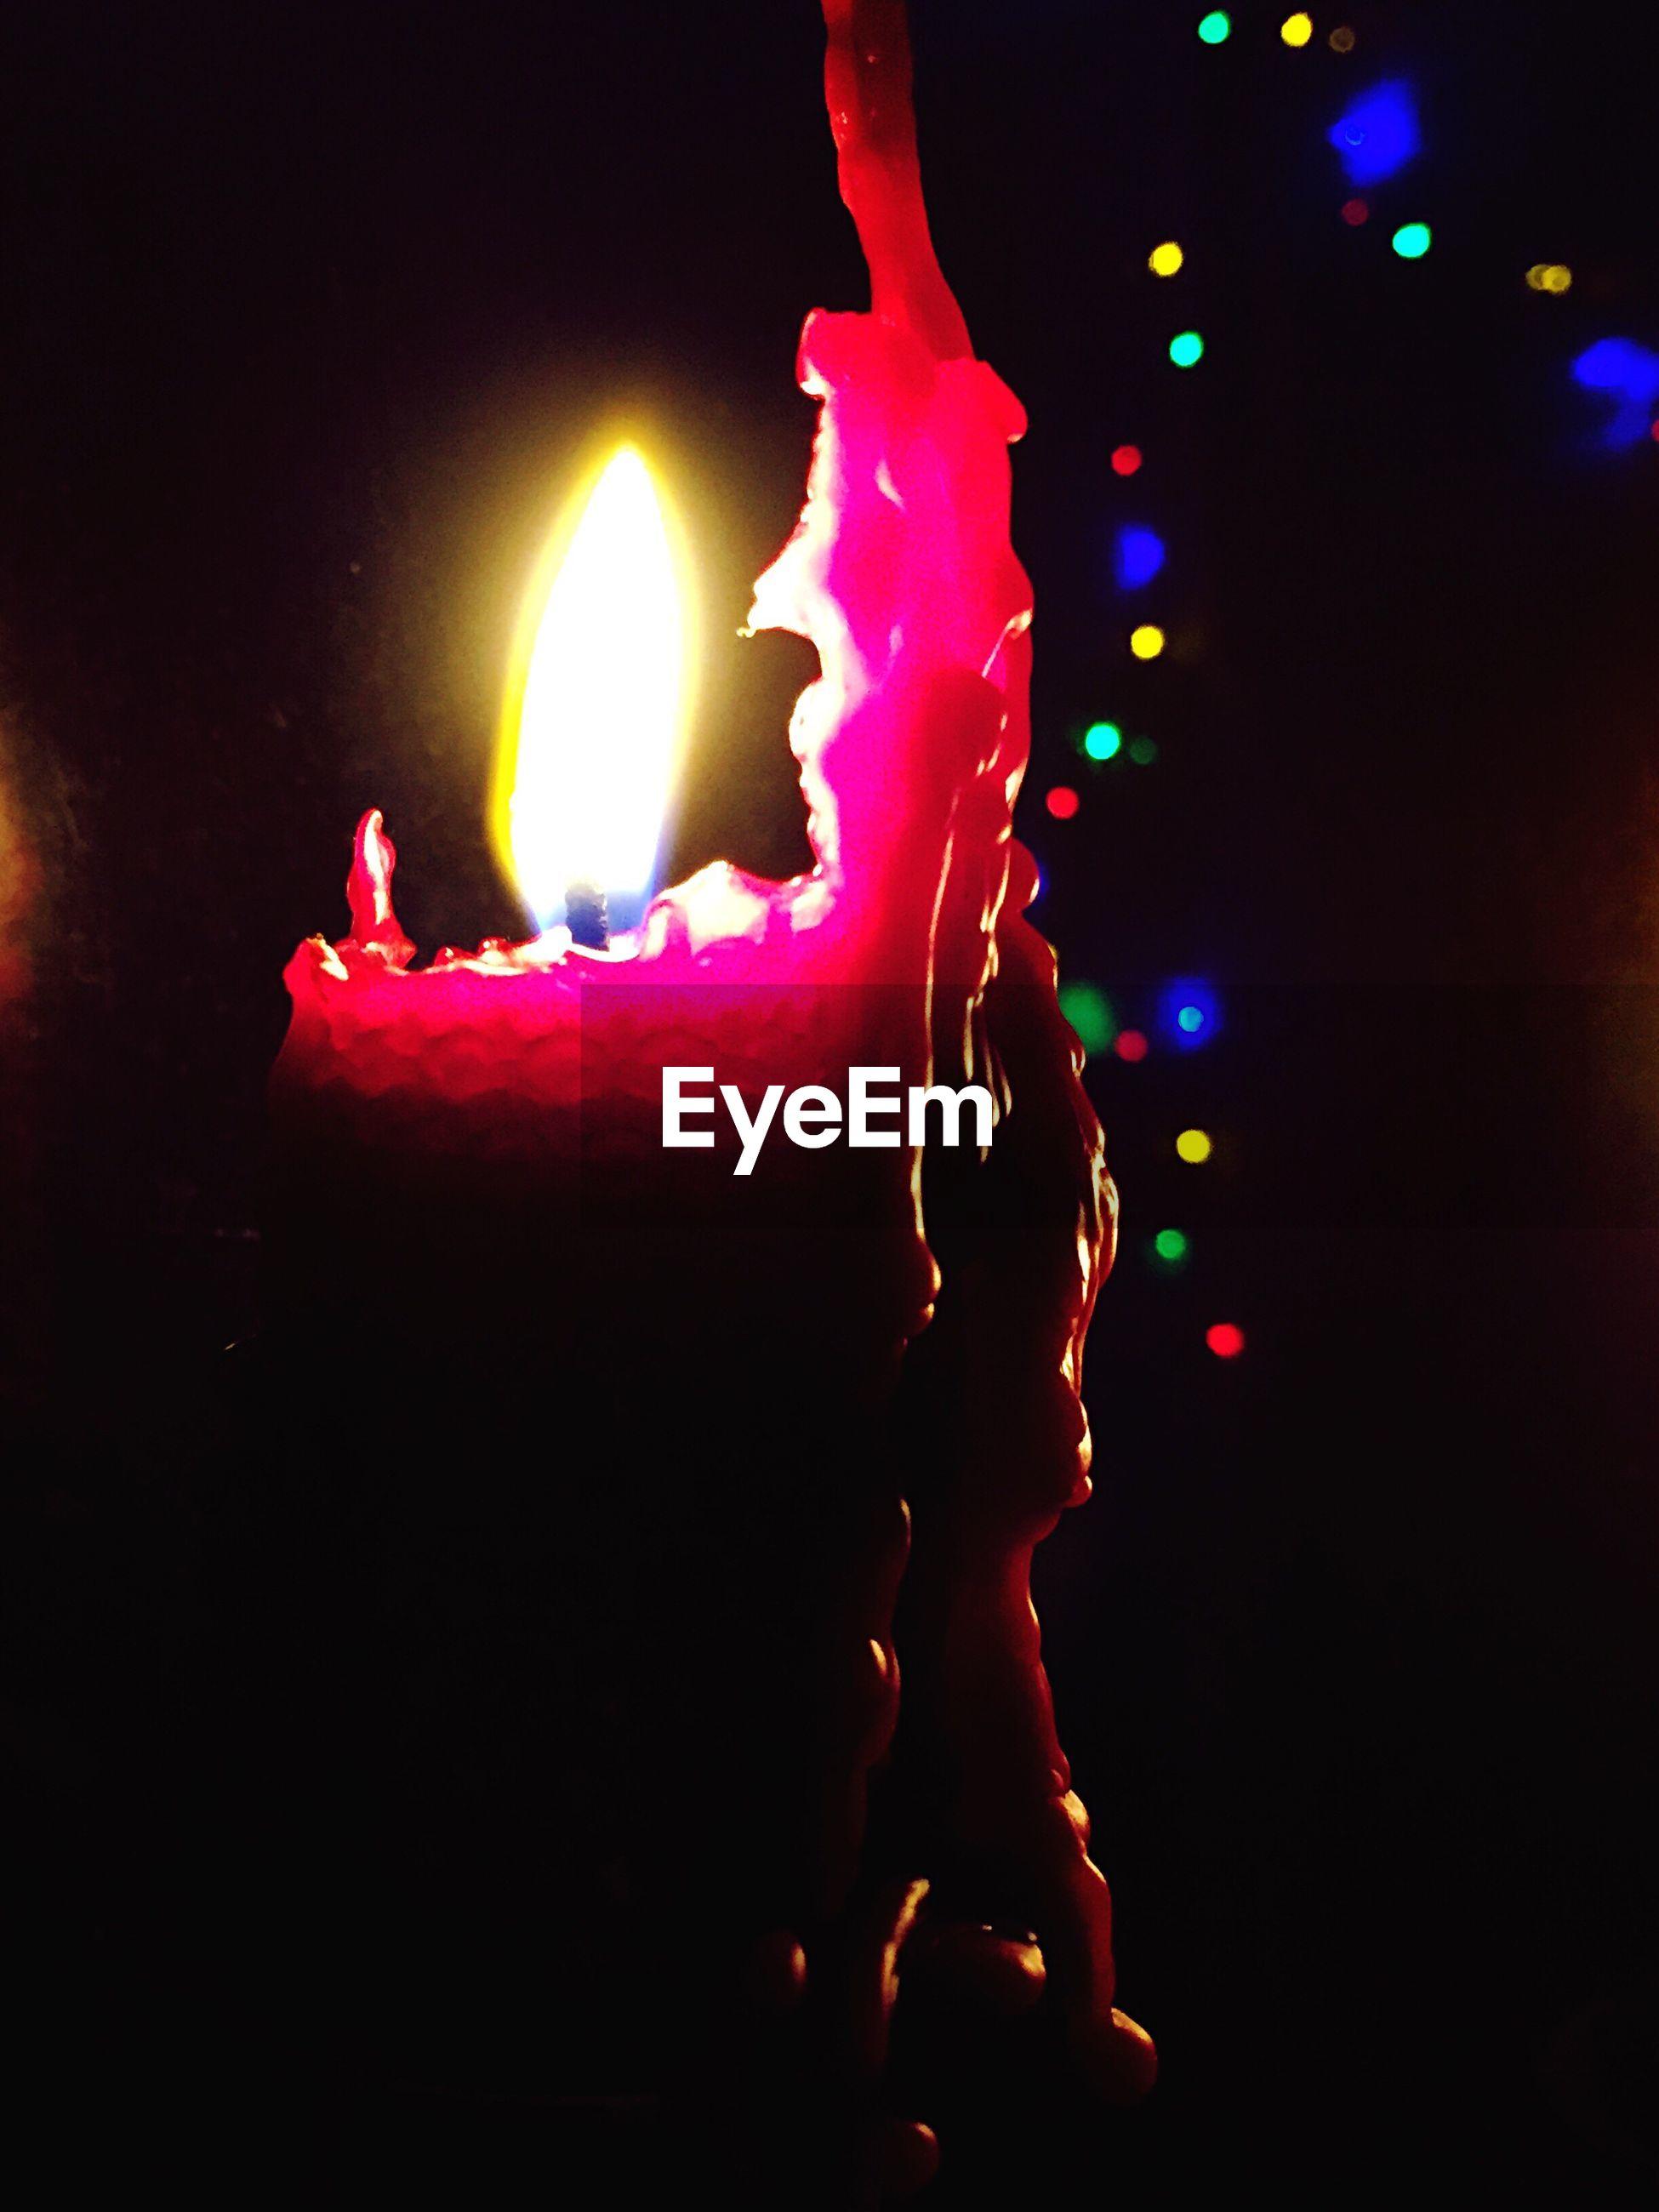 illuminated, night, flame, heat - temperature, lighting equipment, burning, fire - natural phenomenon, close-up, glowing, dark, lit, spark, electric light, red, darkroom, luminosity